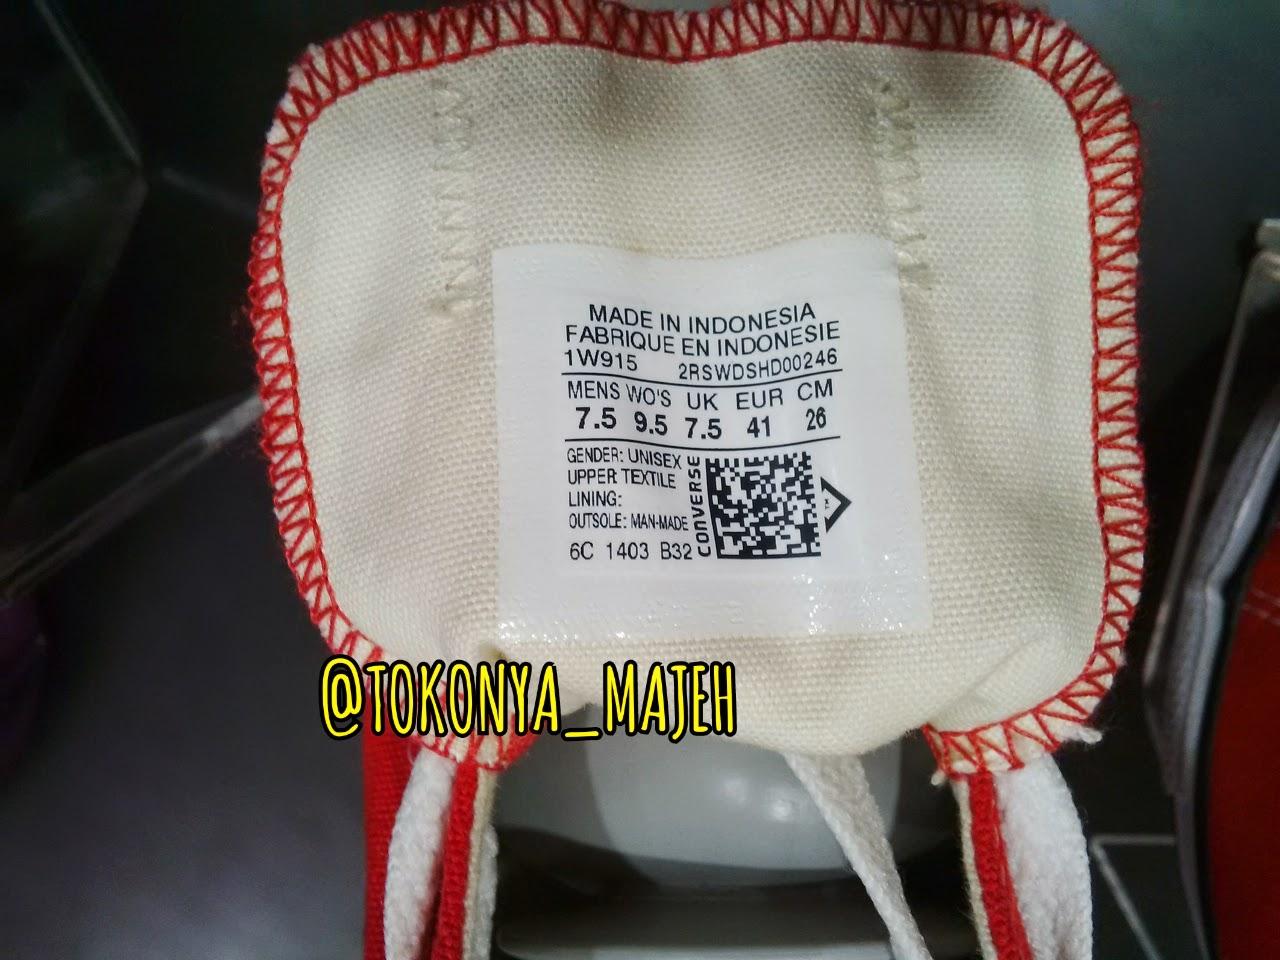 Ciri Sepatu Converse Original Made In Indonesia, Lengkap